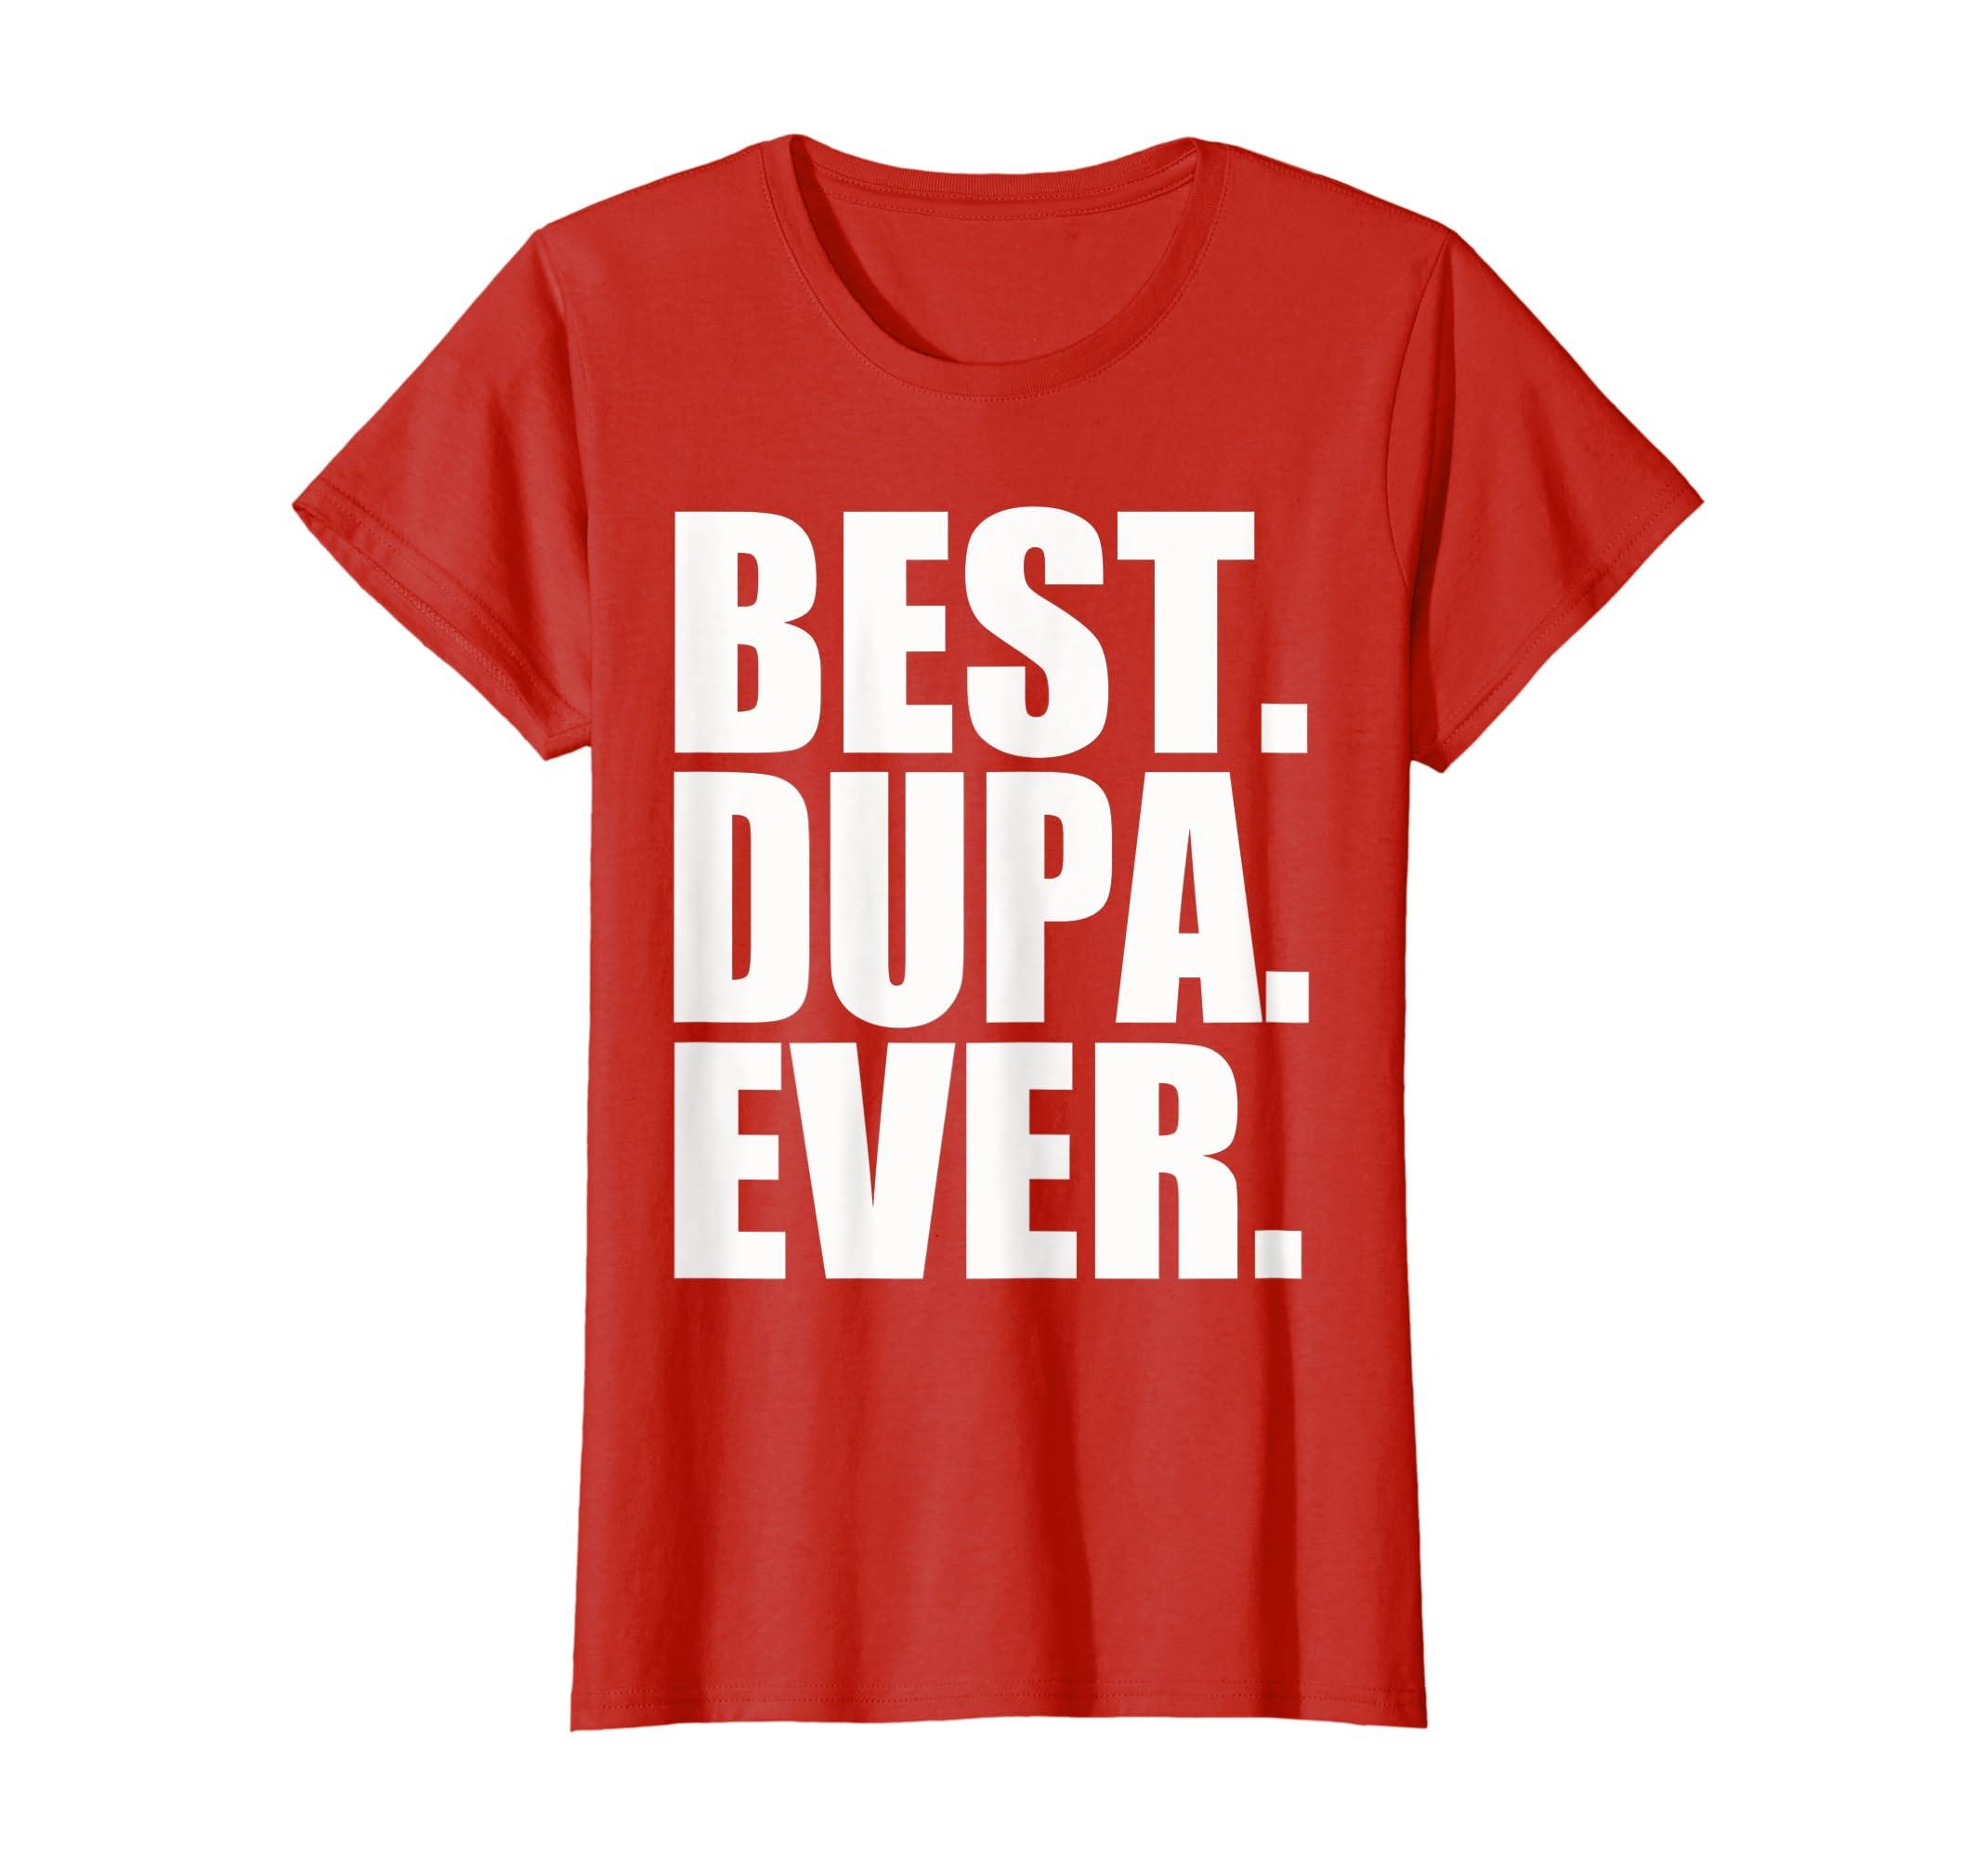 9c6e4c491 Amazon.com: Polish T-Shirt Best Dupa Ever Poland Polska Shirt Gift: Clothing